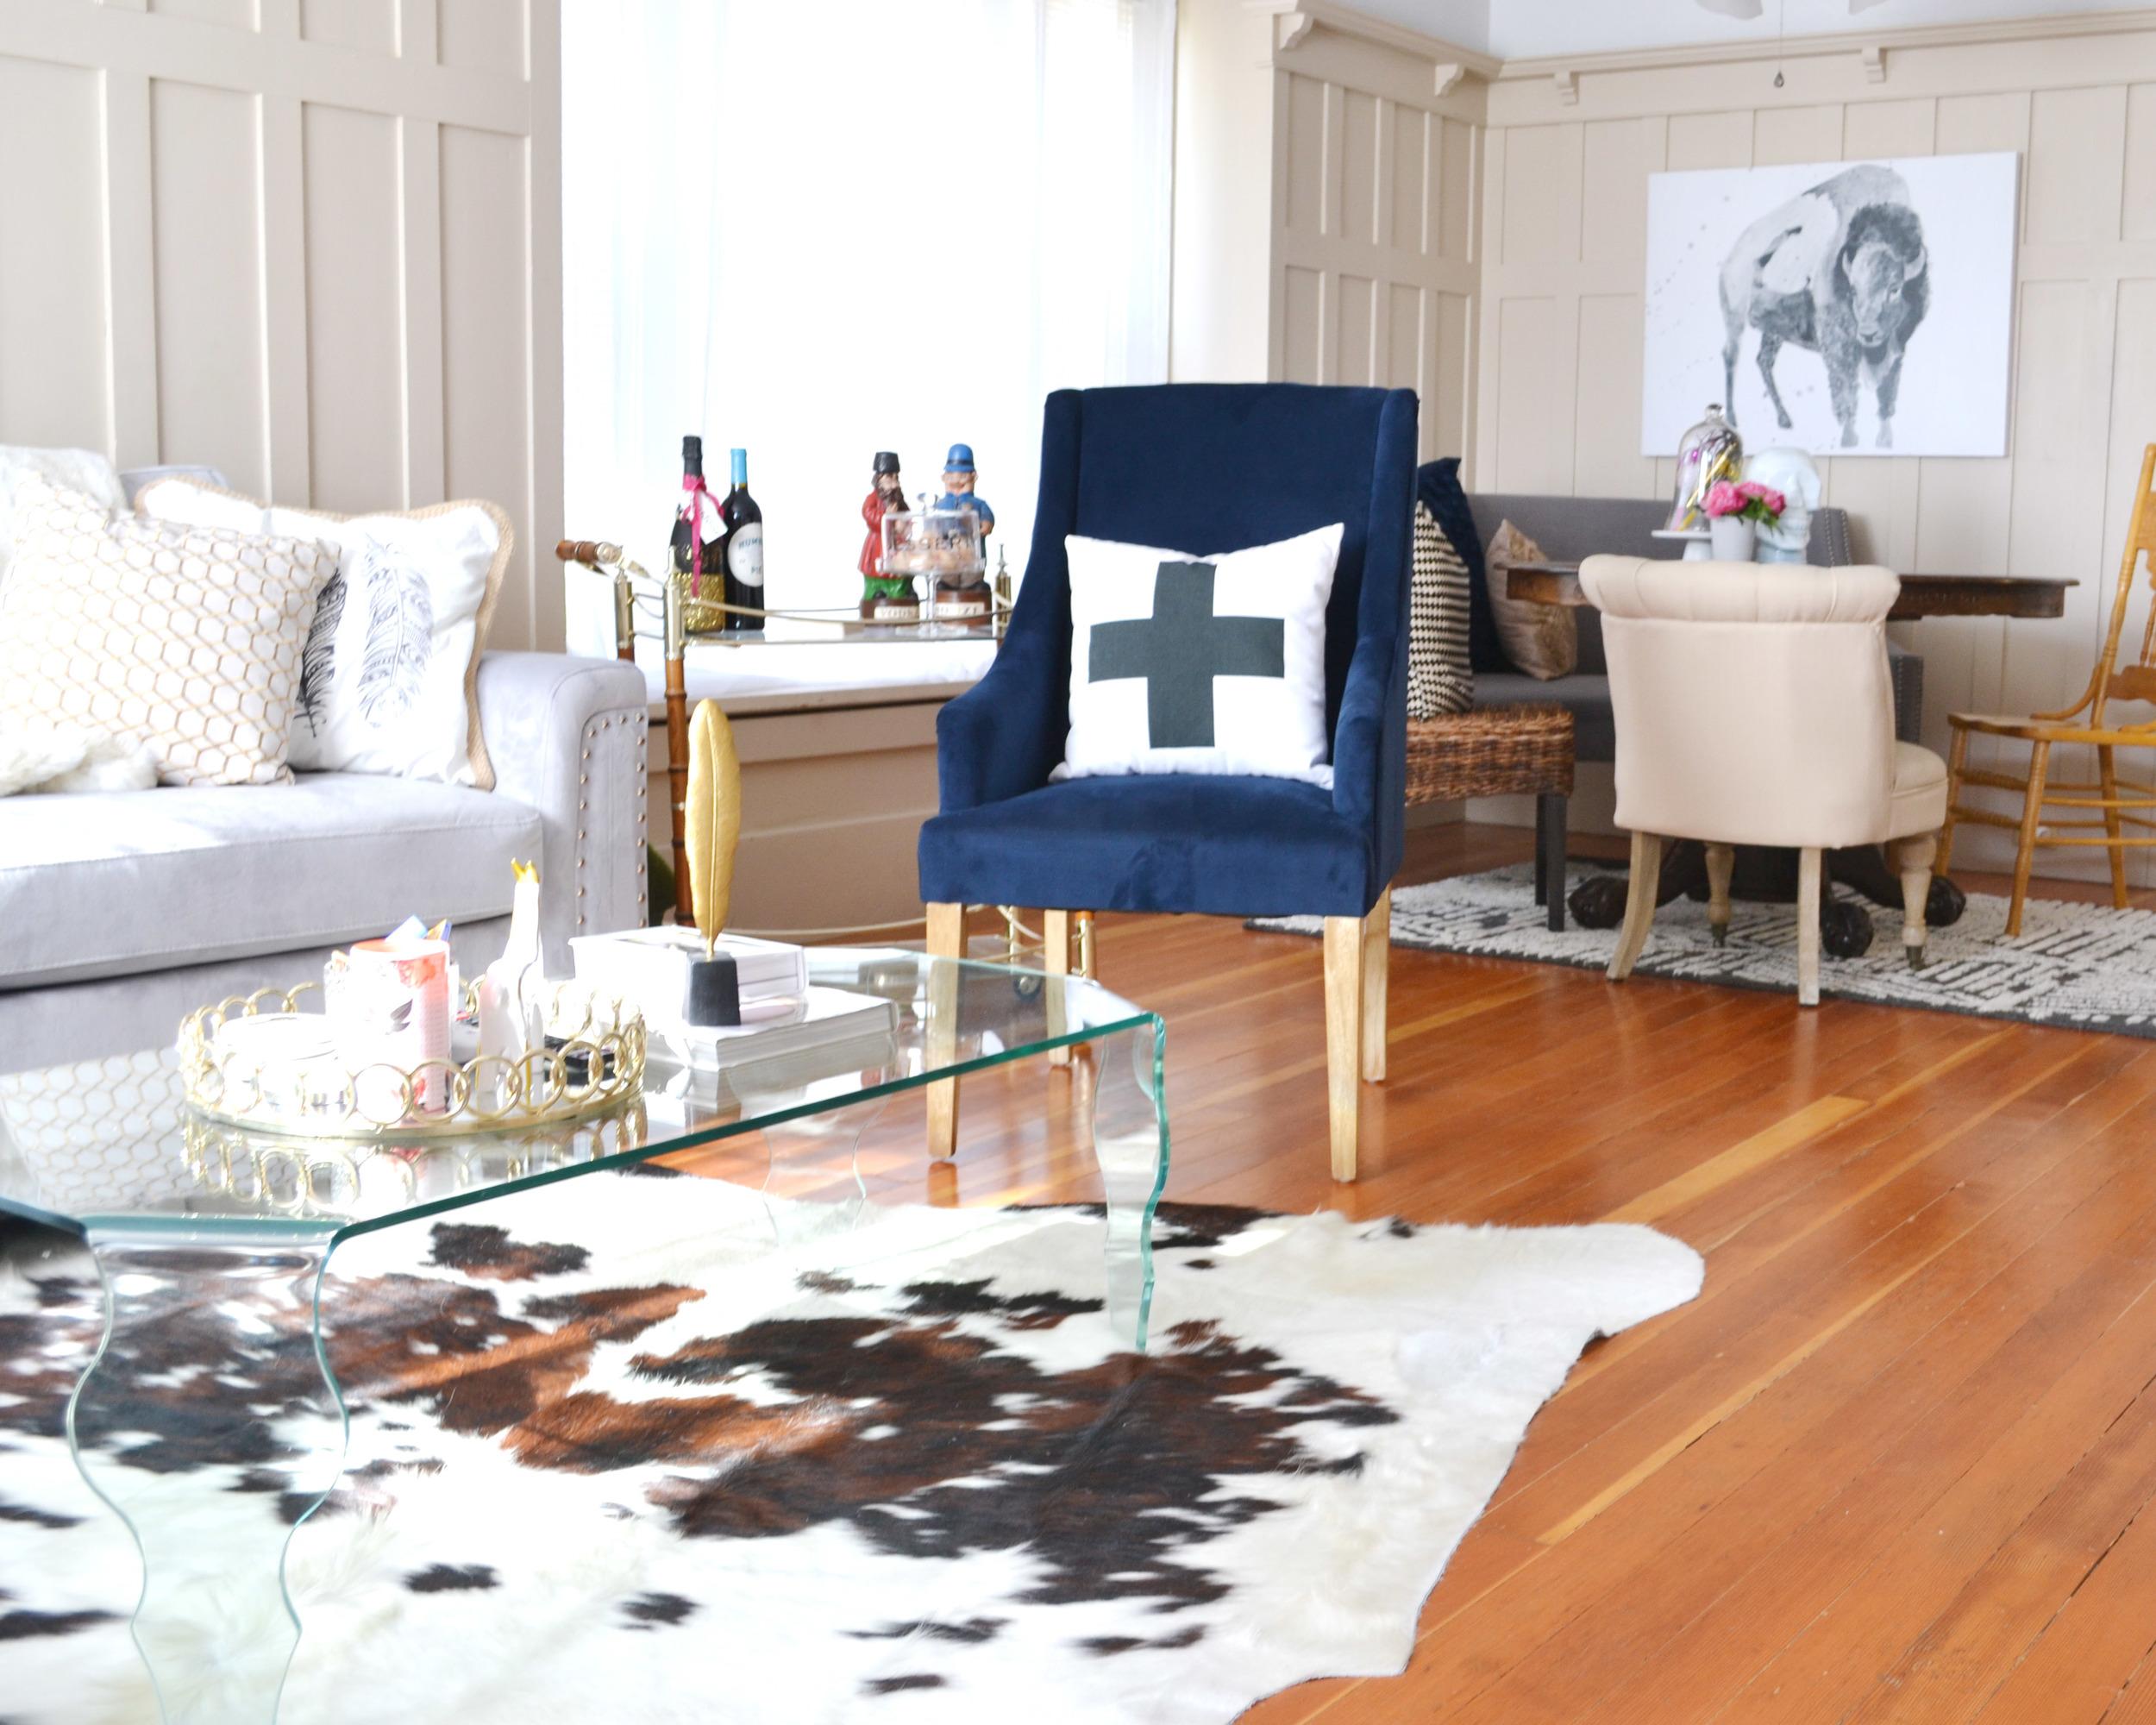 Chic Bachelorette Pad & Decorating on a Budget | Boxwood Avenue